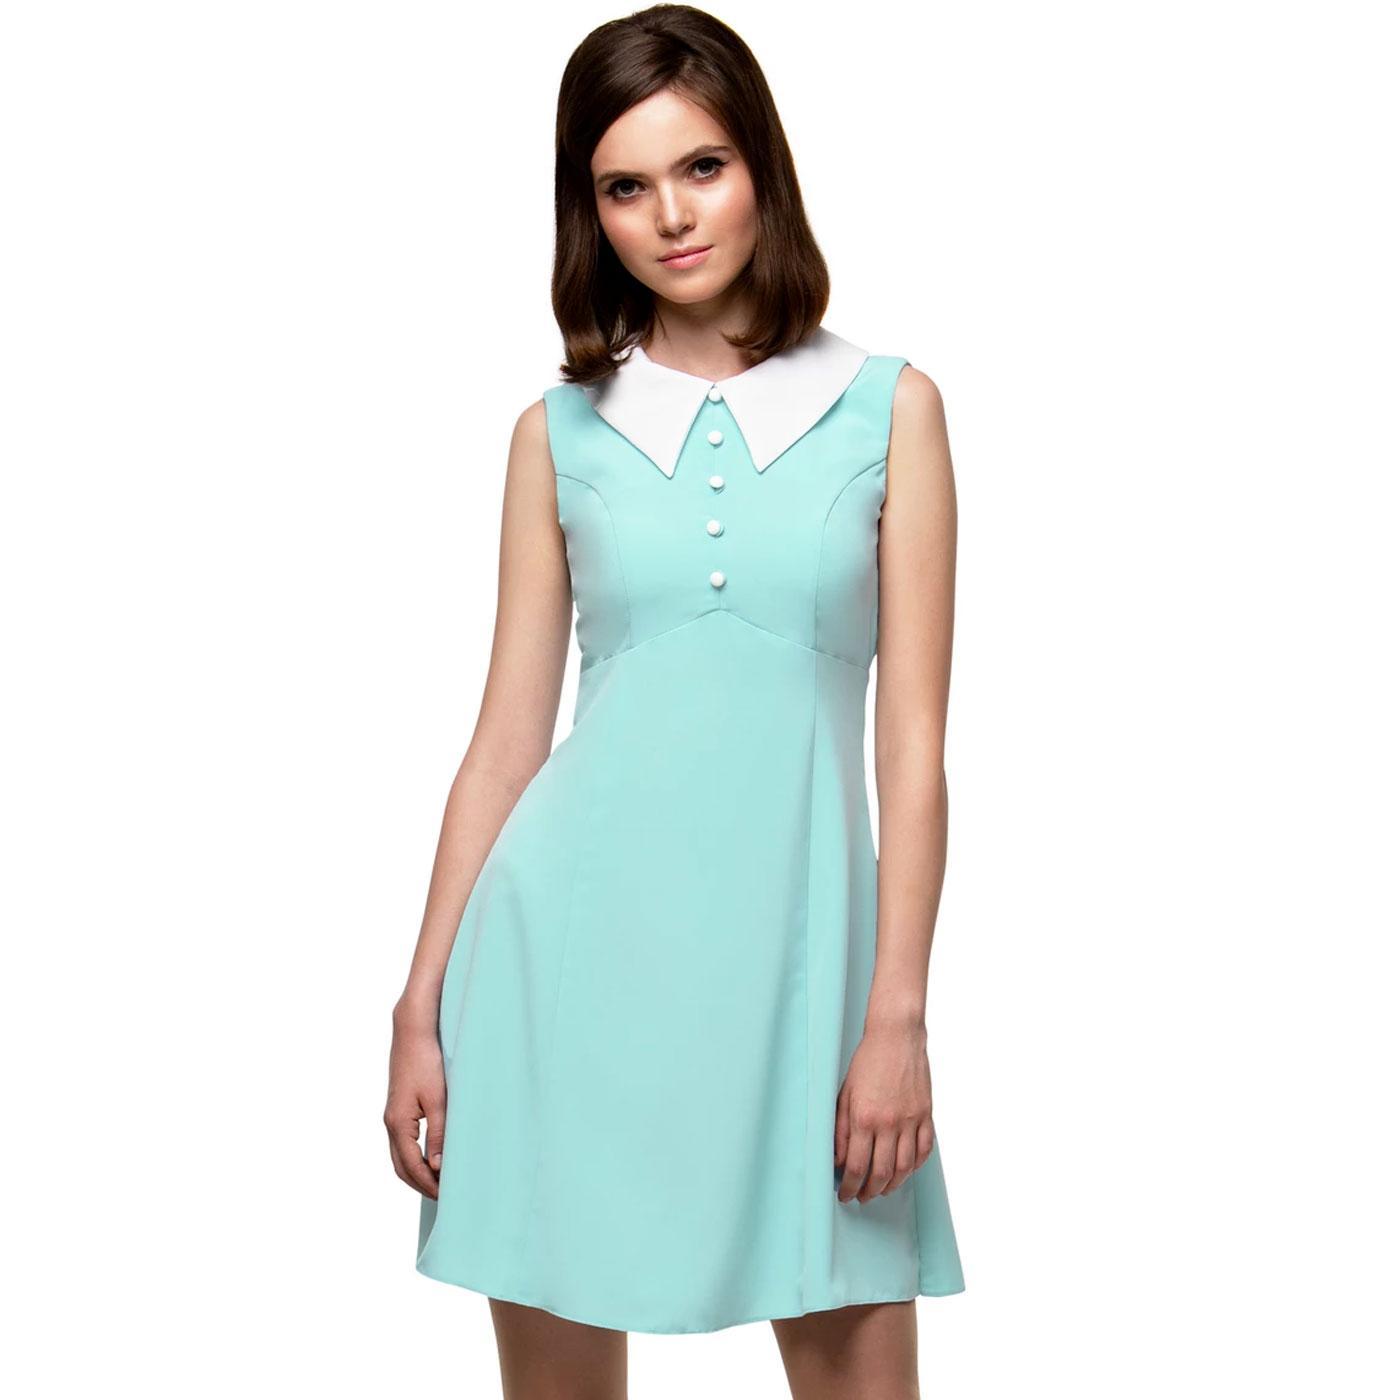 MARMALADE Retro 1960s Mod Big Collar Dress (Mint)